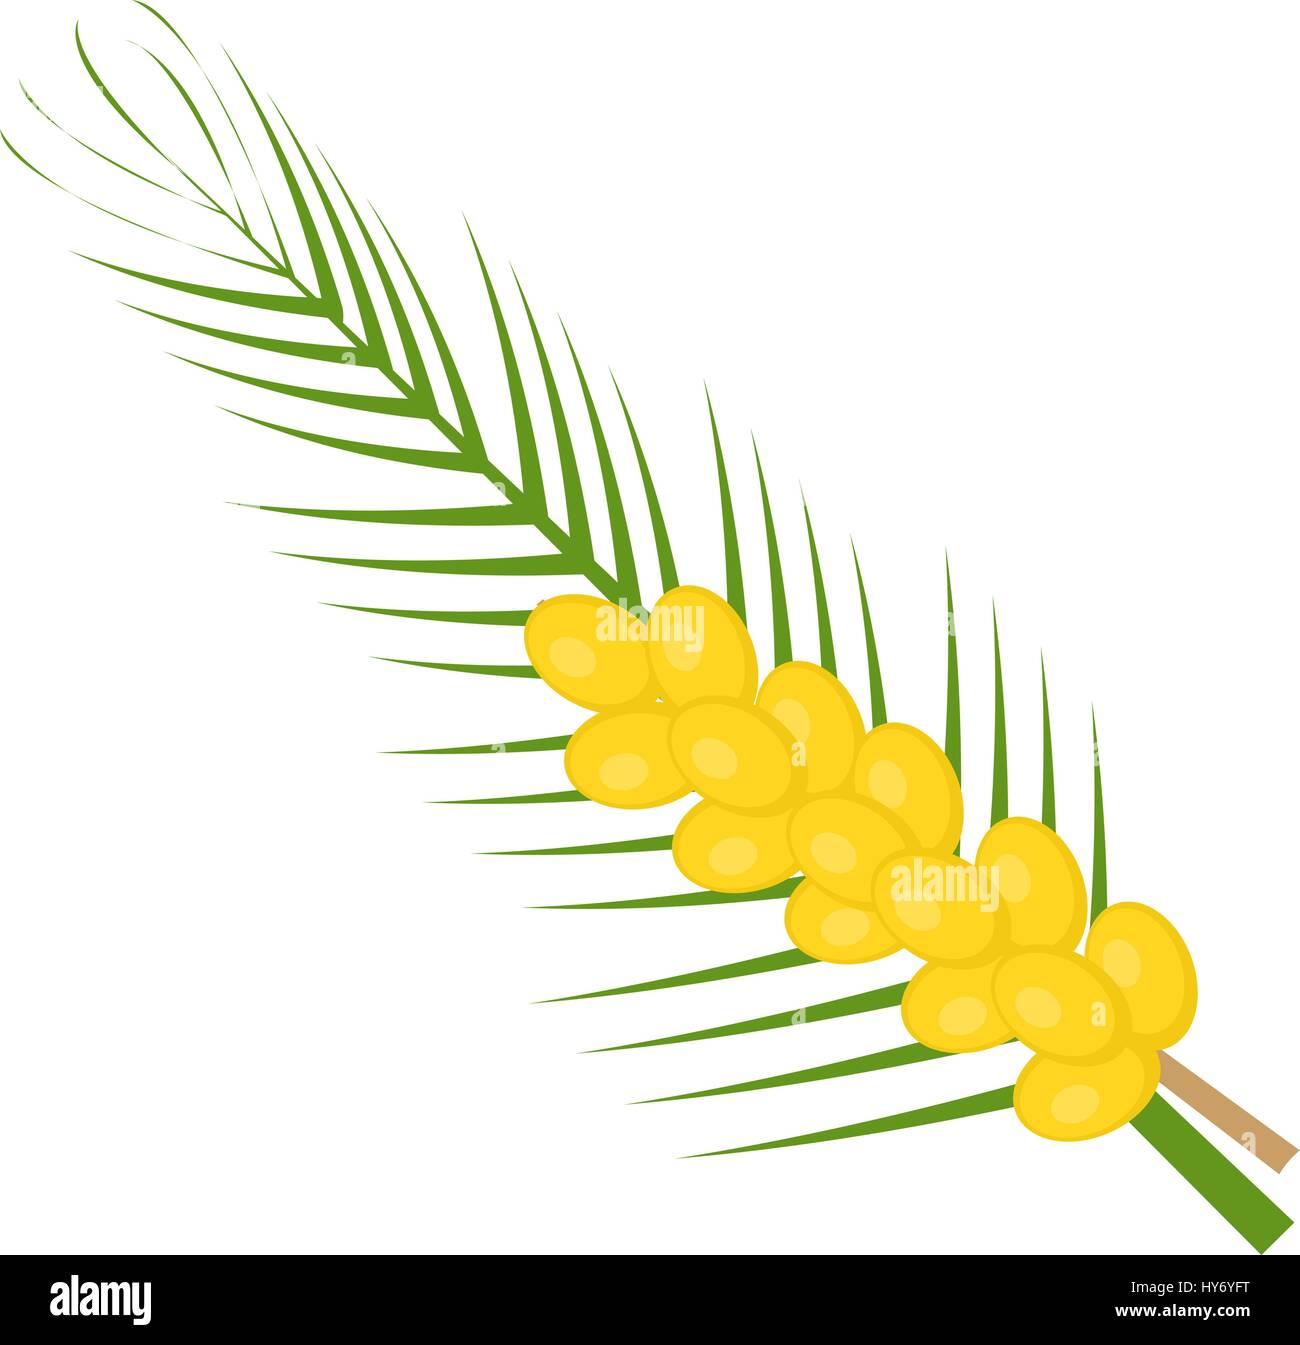 Fresh dates icon flat, cartoon style. Yellow fruit isolated on white background. Vector illustration, clip-art. - Stock Vector